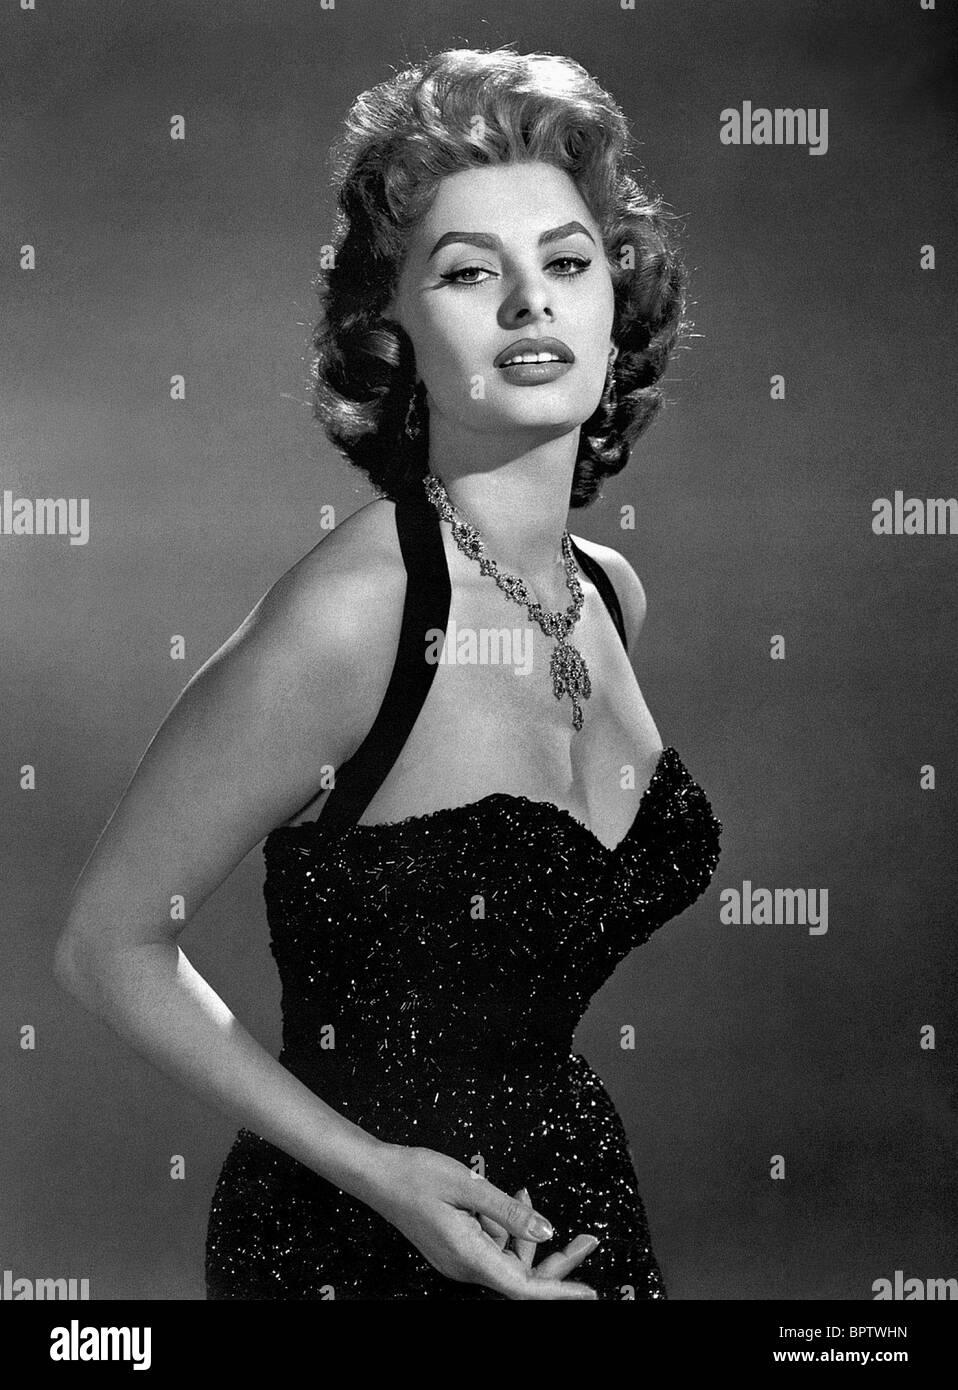 SOPHIA LOREN ACTRESS (1956) - Stock Image